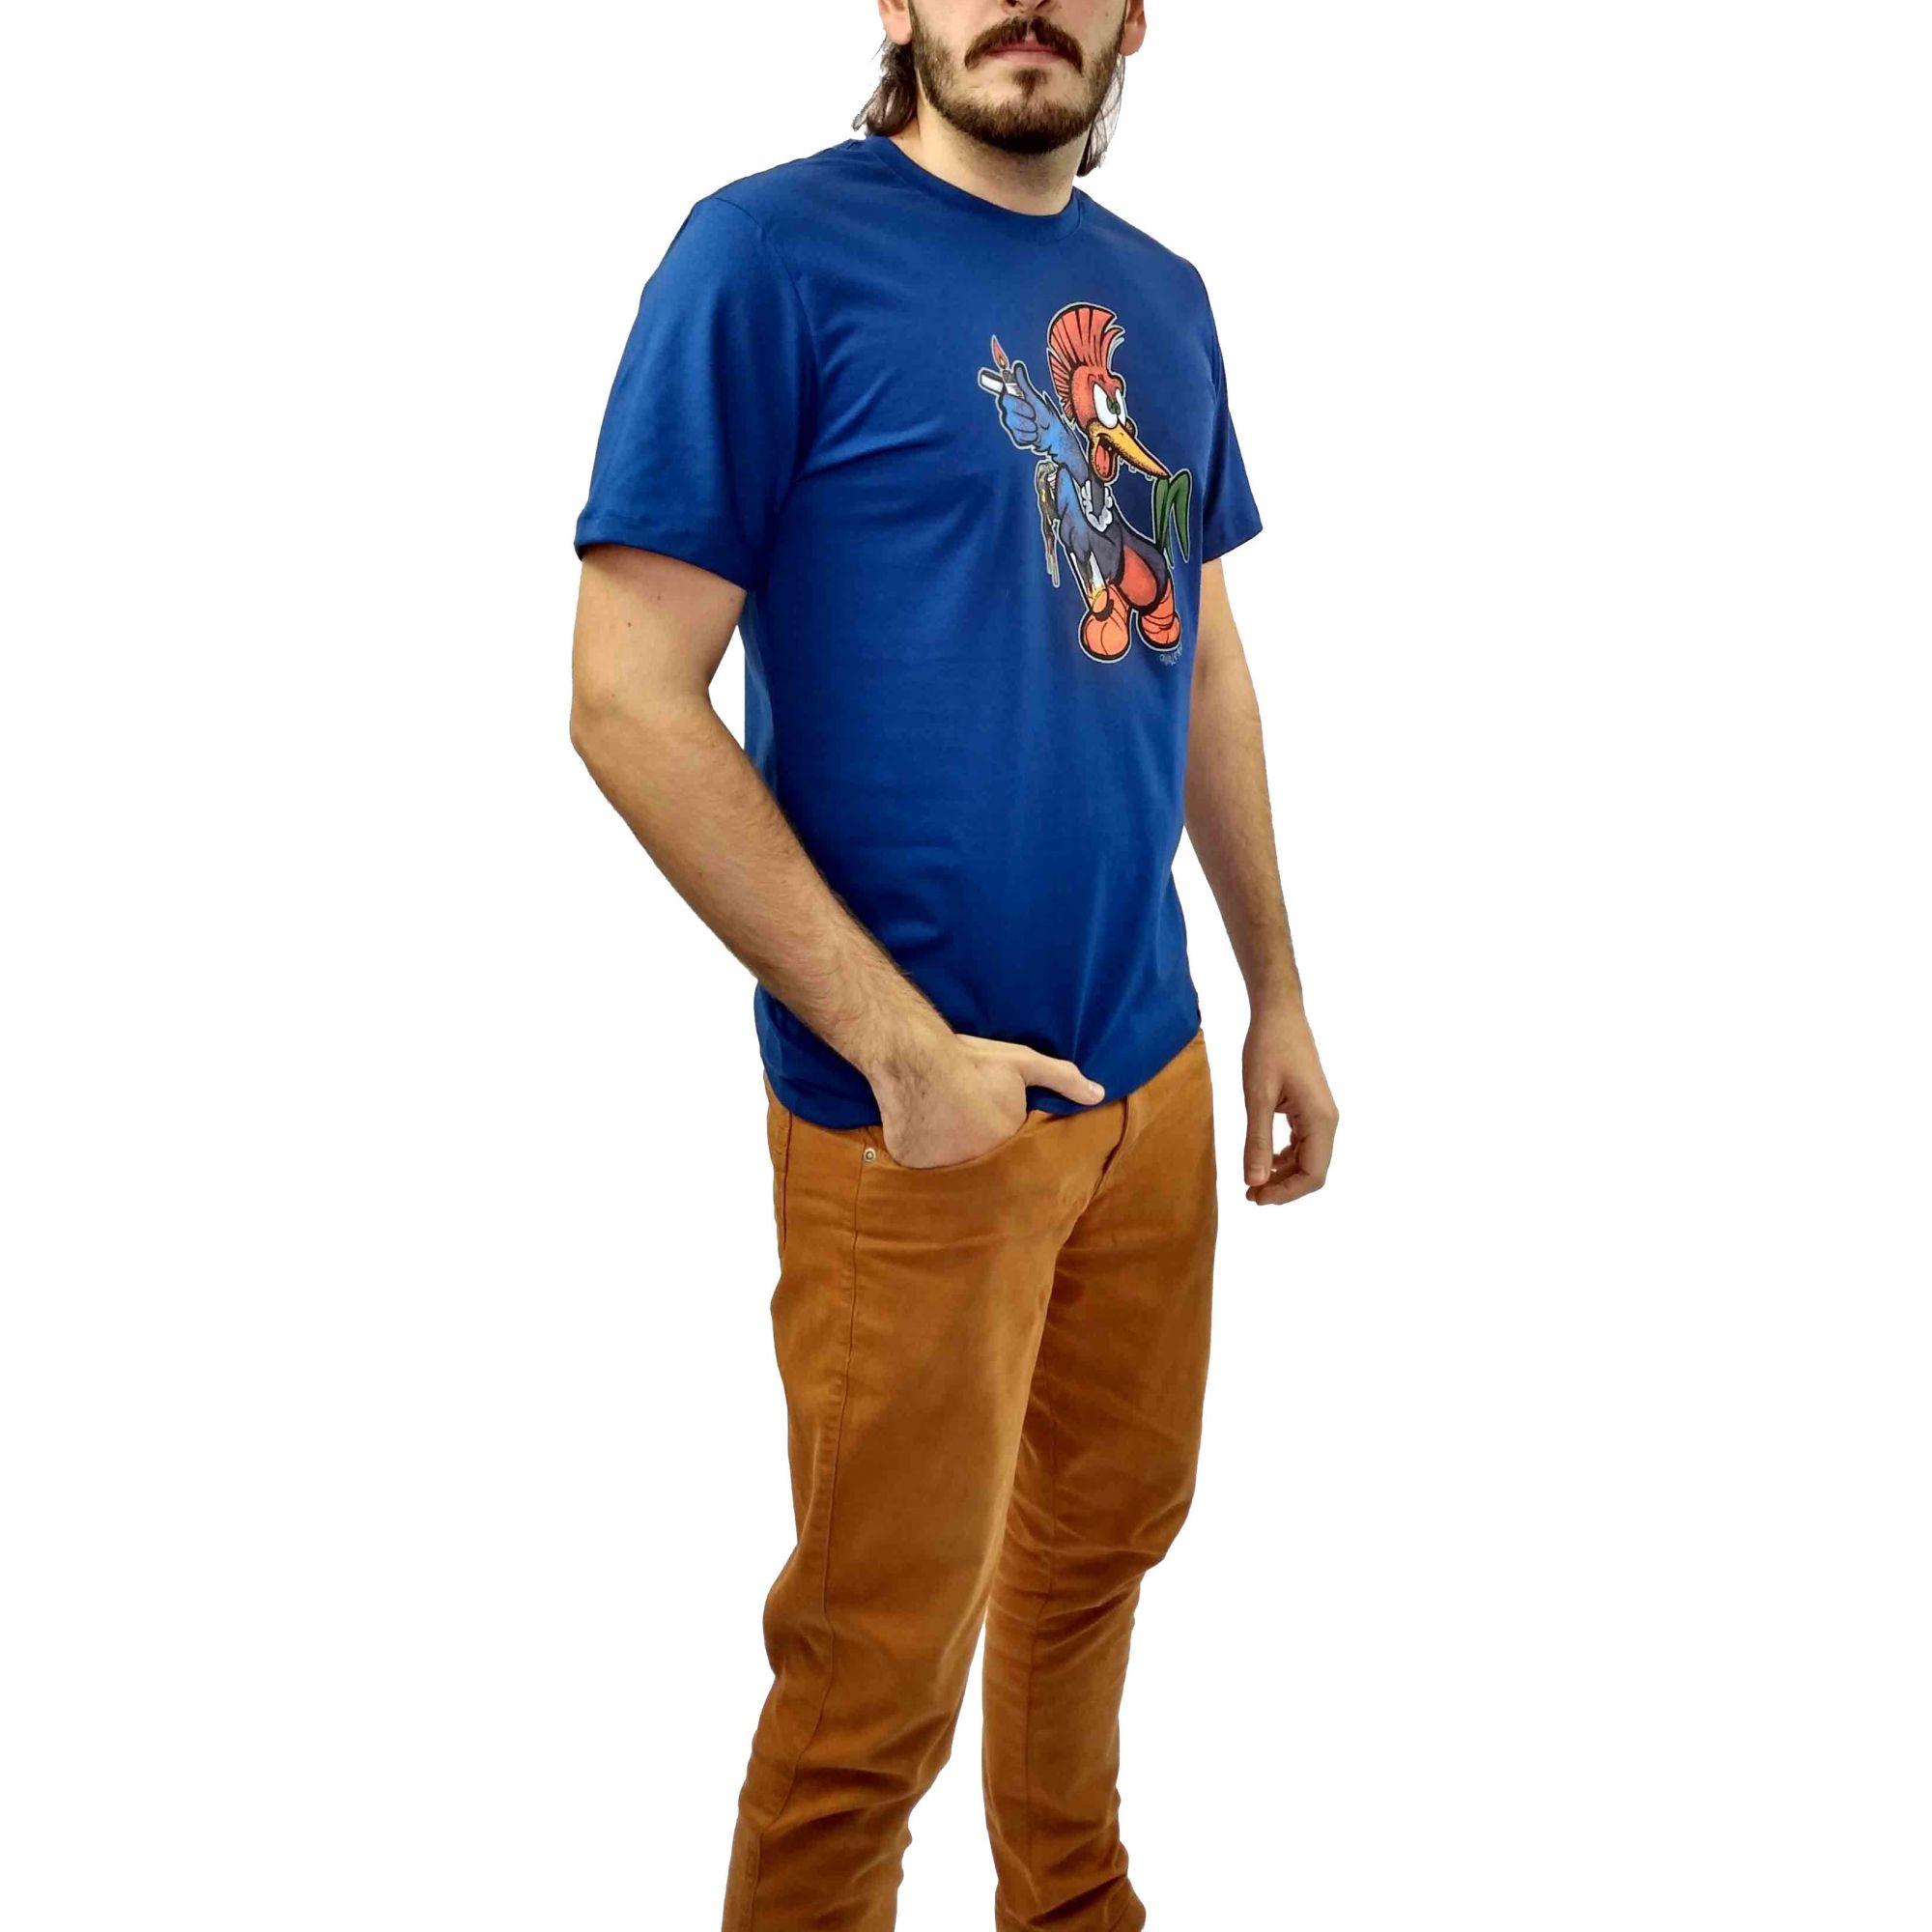 Camiseta Cavalera Masculina Pica Pau Azul